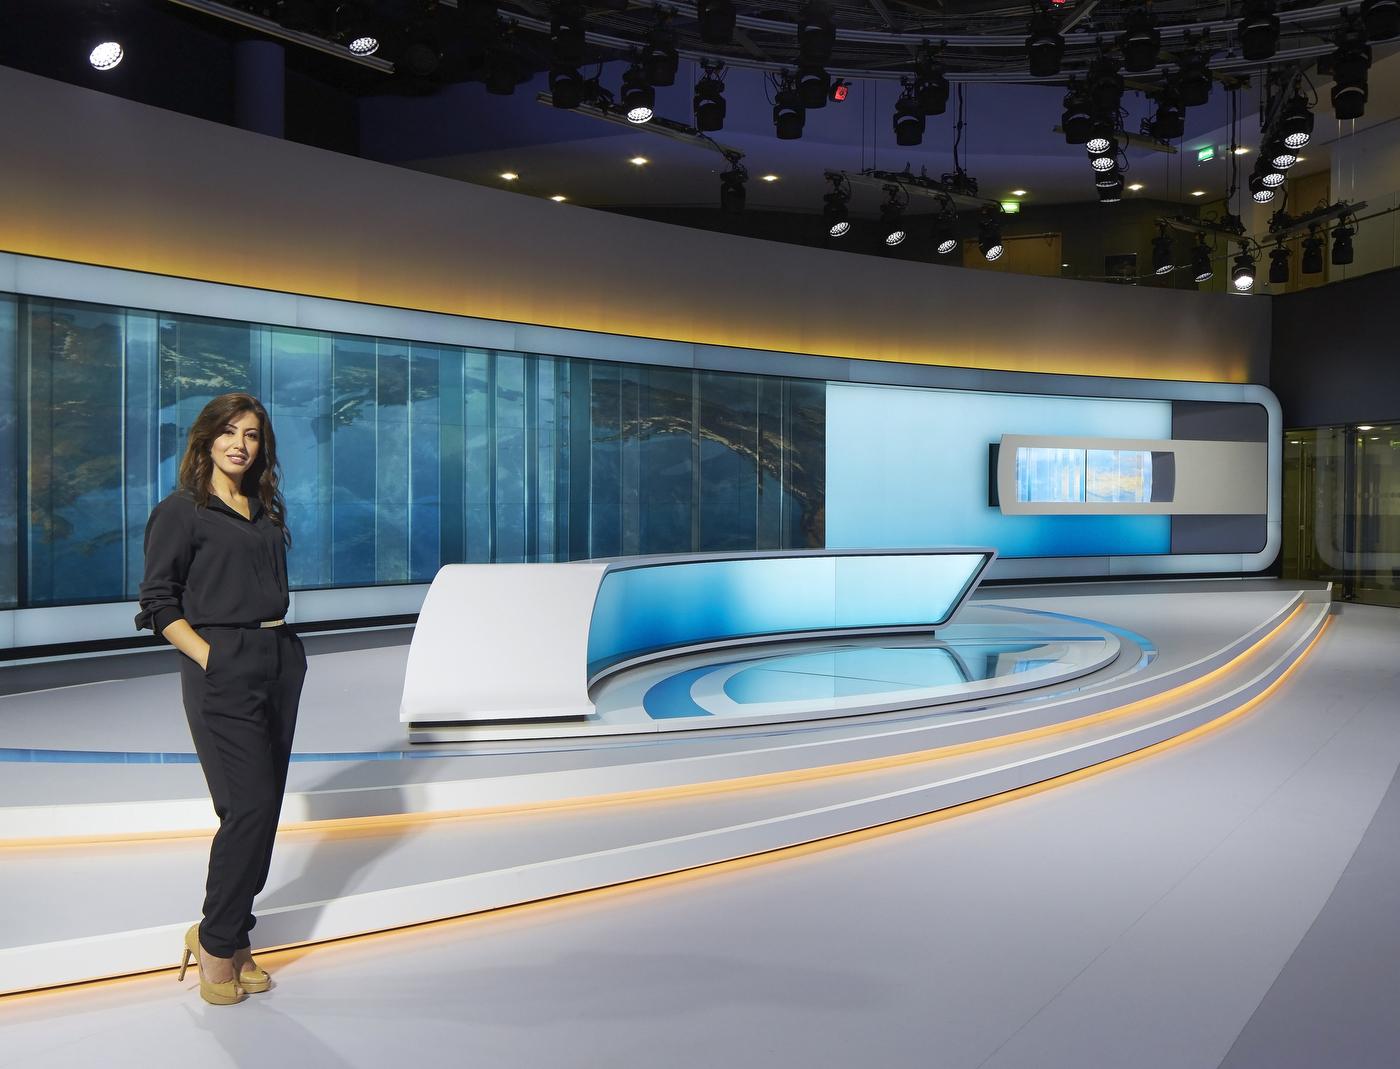 NCS_Al-Jazeera-Newsroom-Studio-5_0014